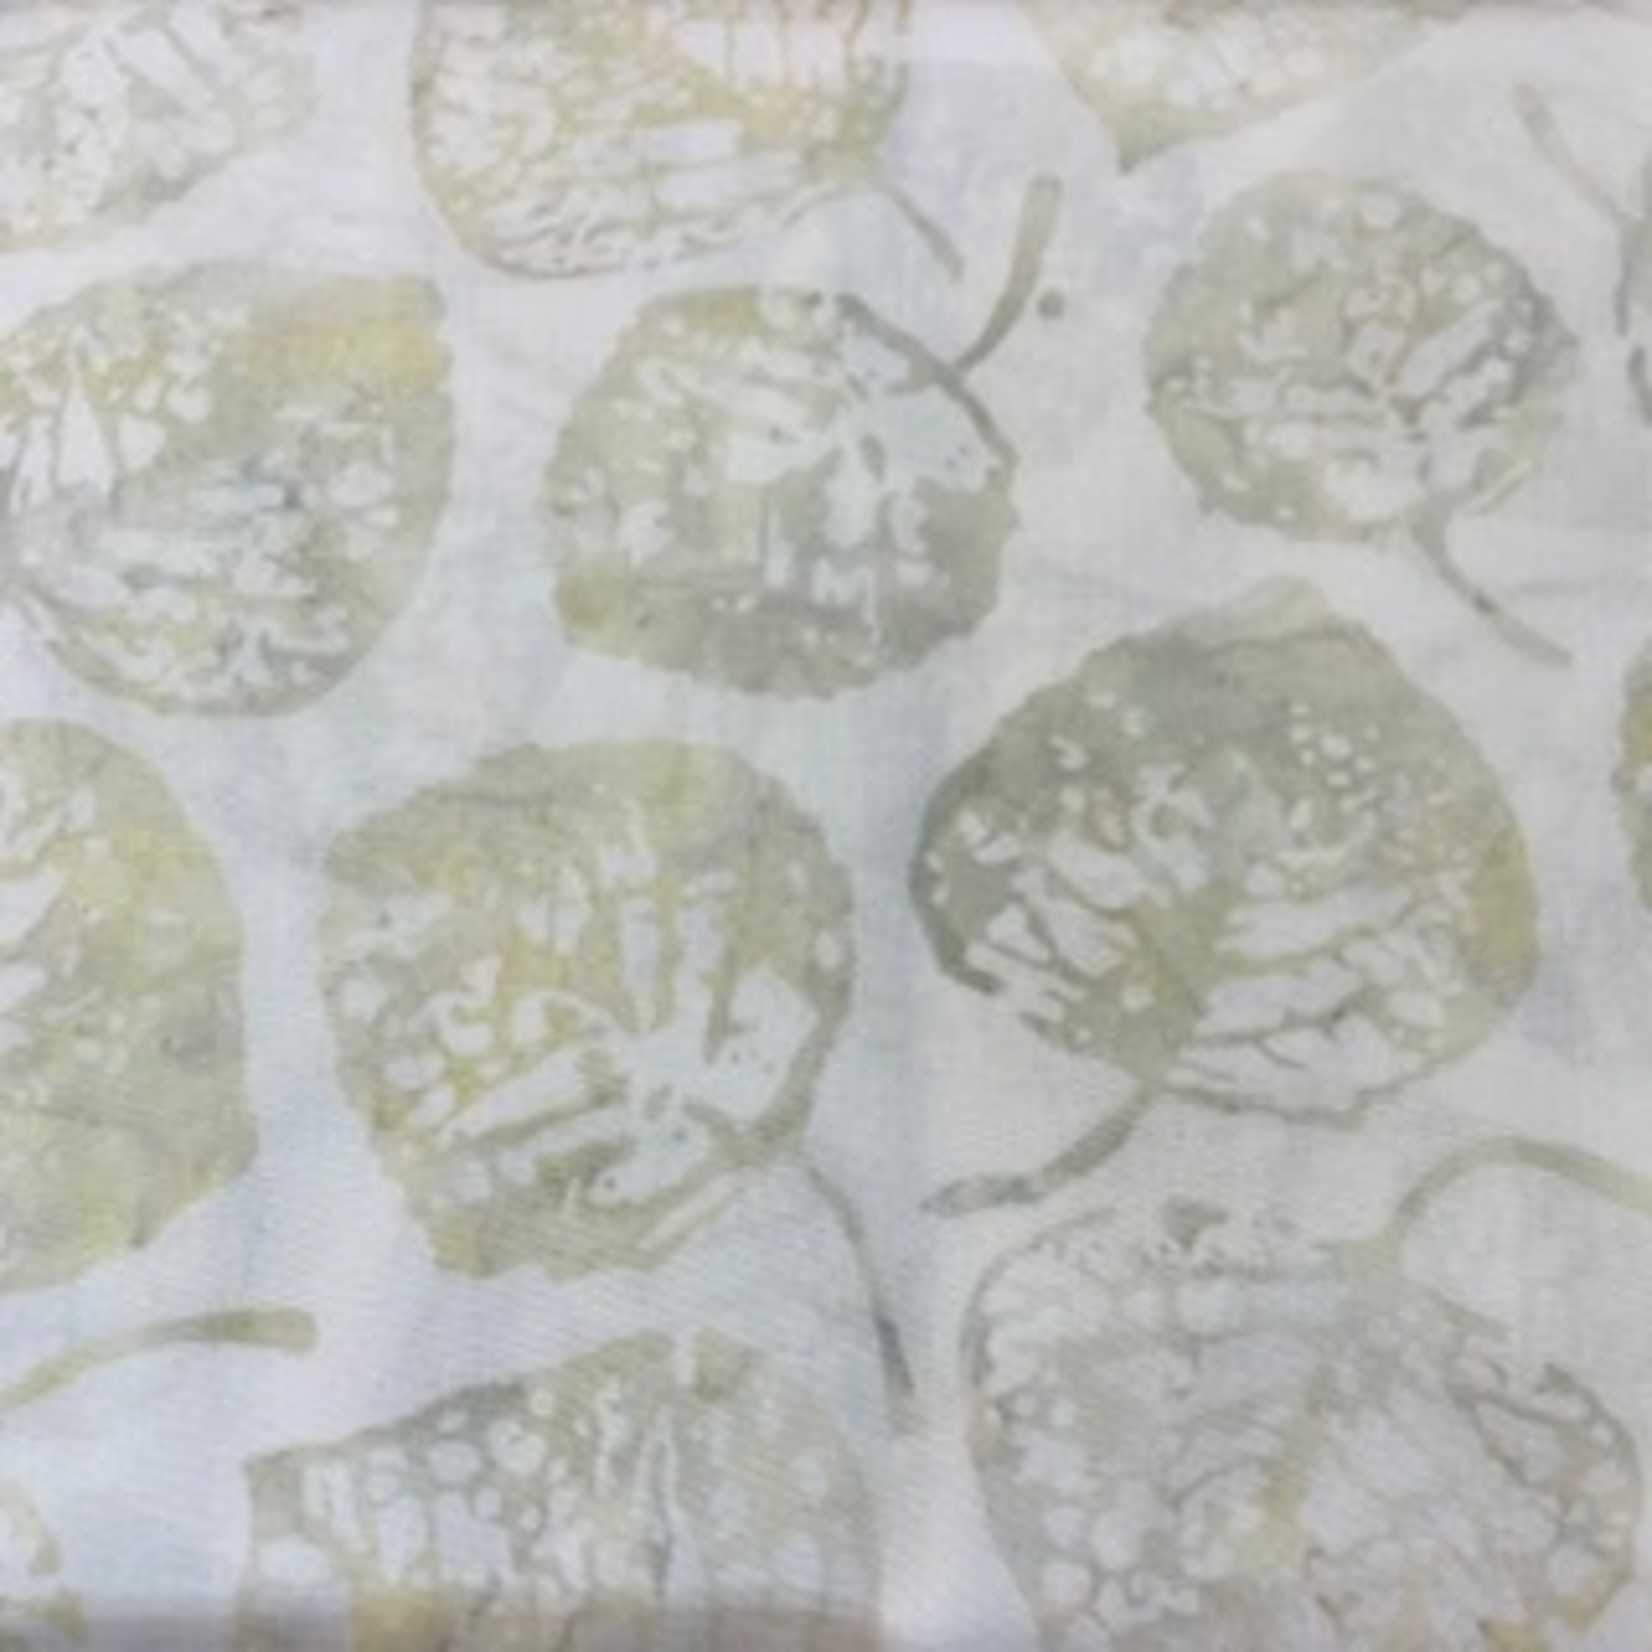 Hoffman Fabrics Bali Batik Leaves 2056 - 265 Oyster